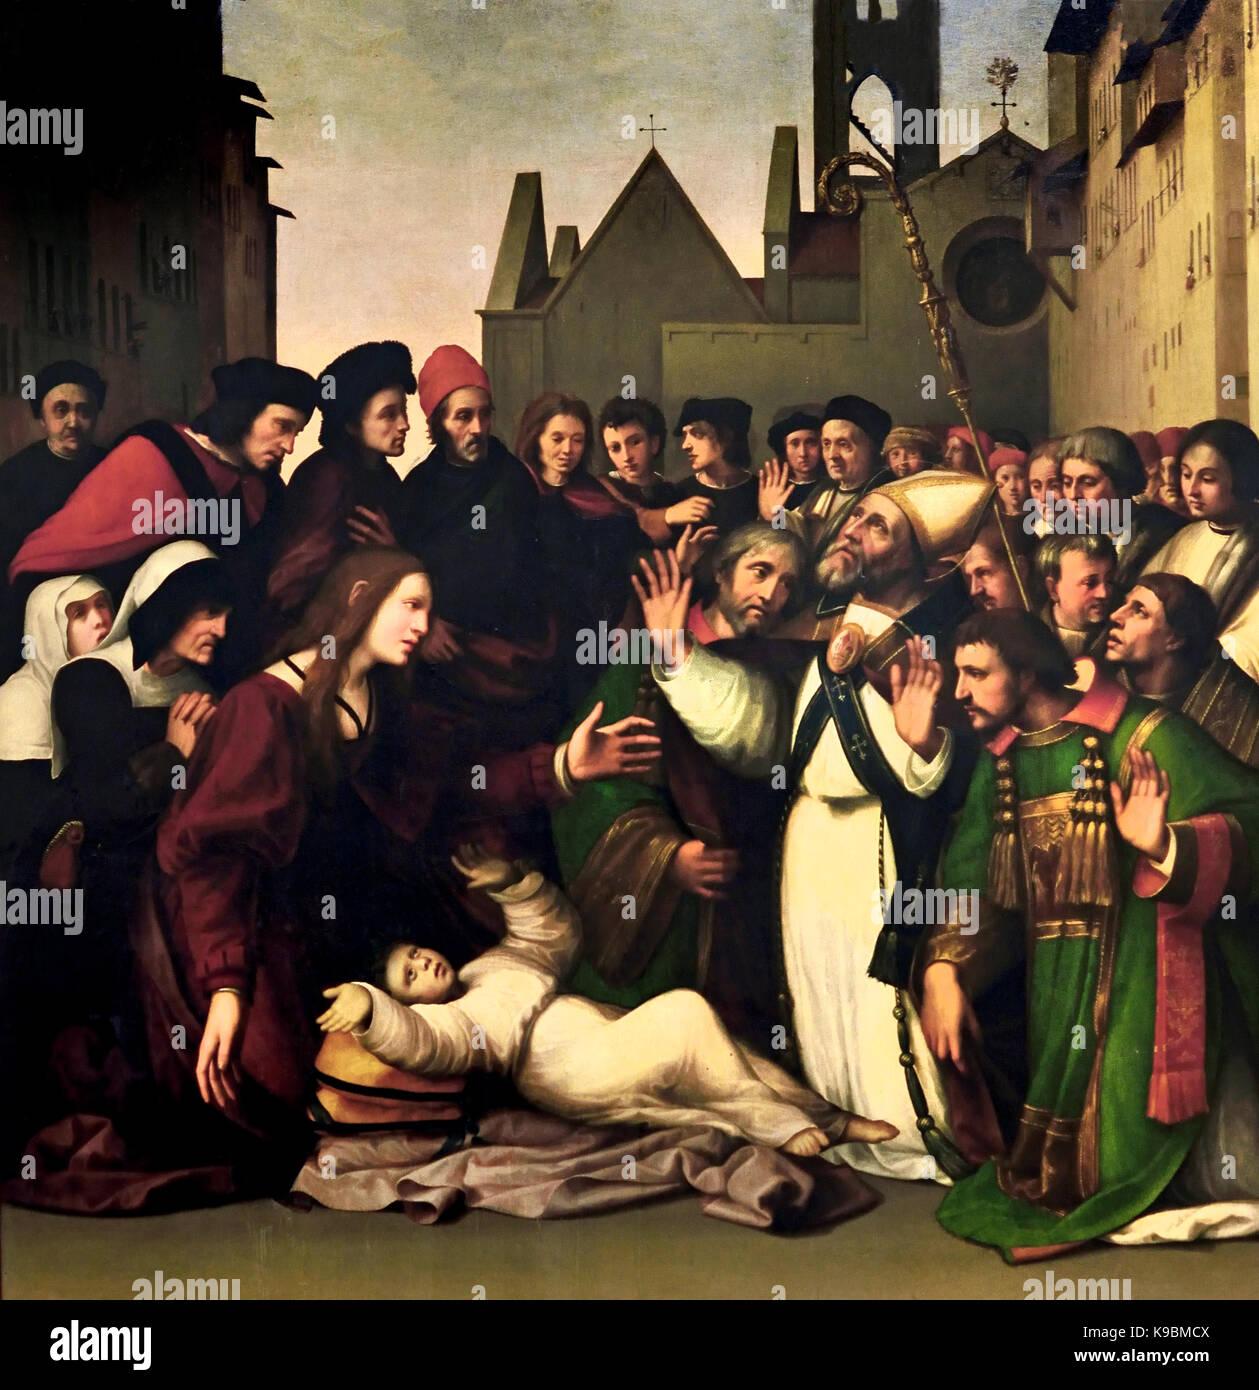 Saint Zenobius raises a Boy from the Dead by Ridolfo Ghirlandaio (or Ghirlandajo) 1483 – 1561 was an Italian Renaissance - Stock Image